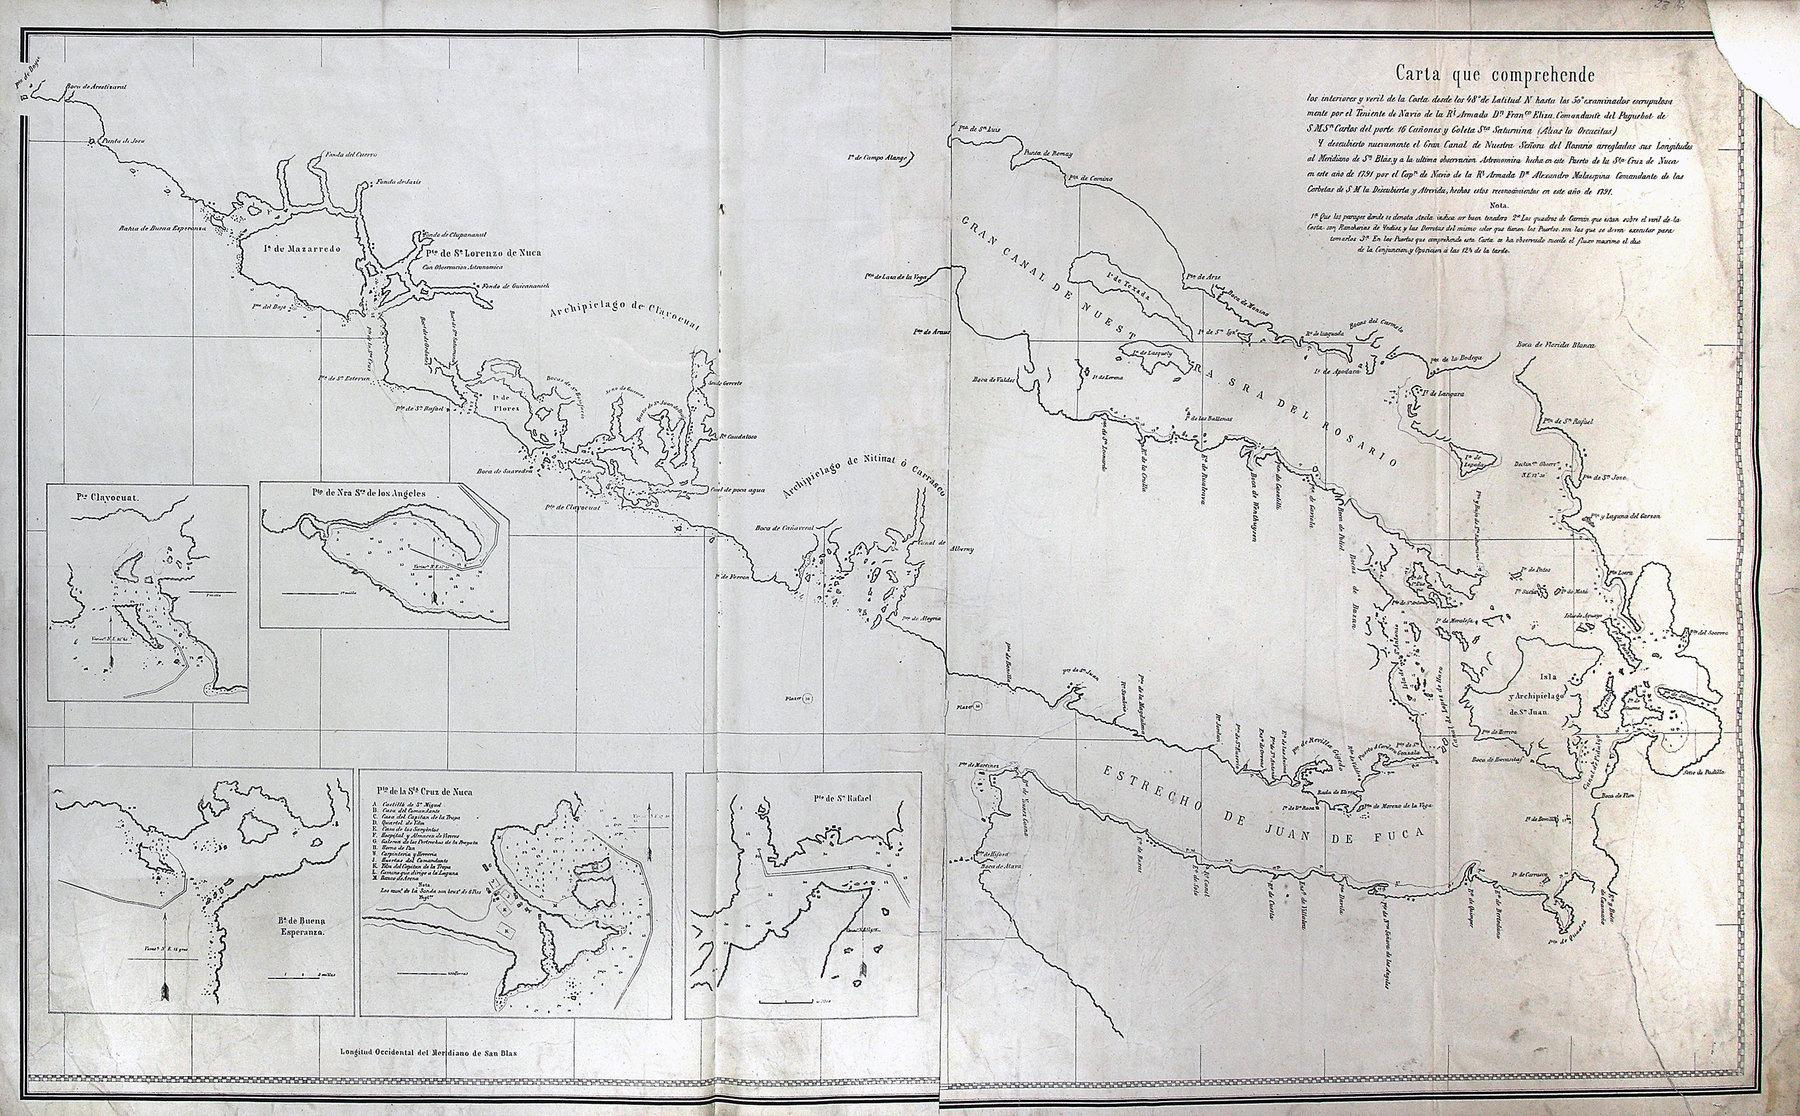 San Juan boundary dispute maps [map H].